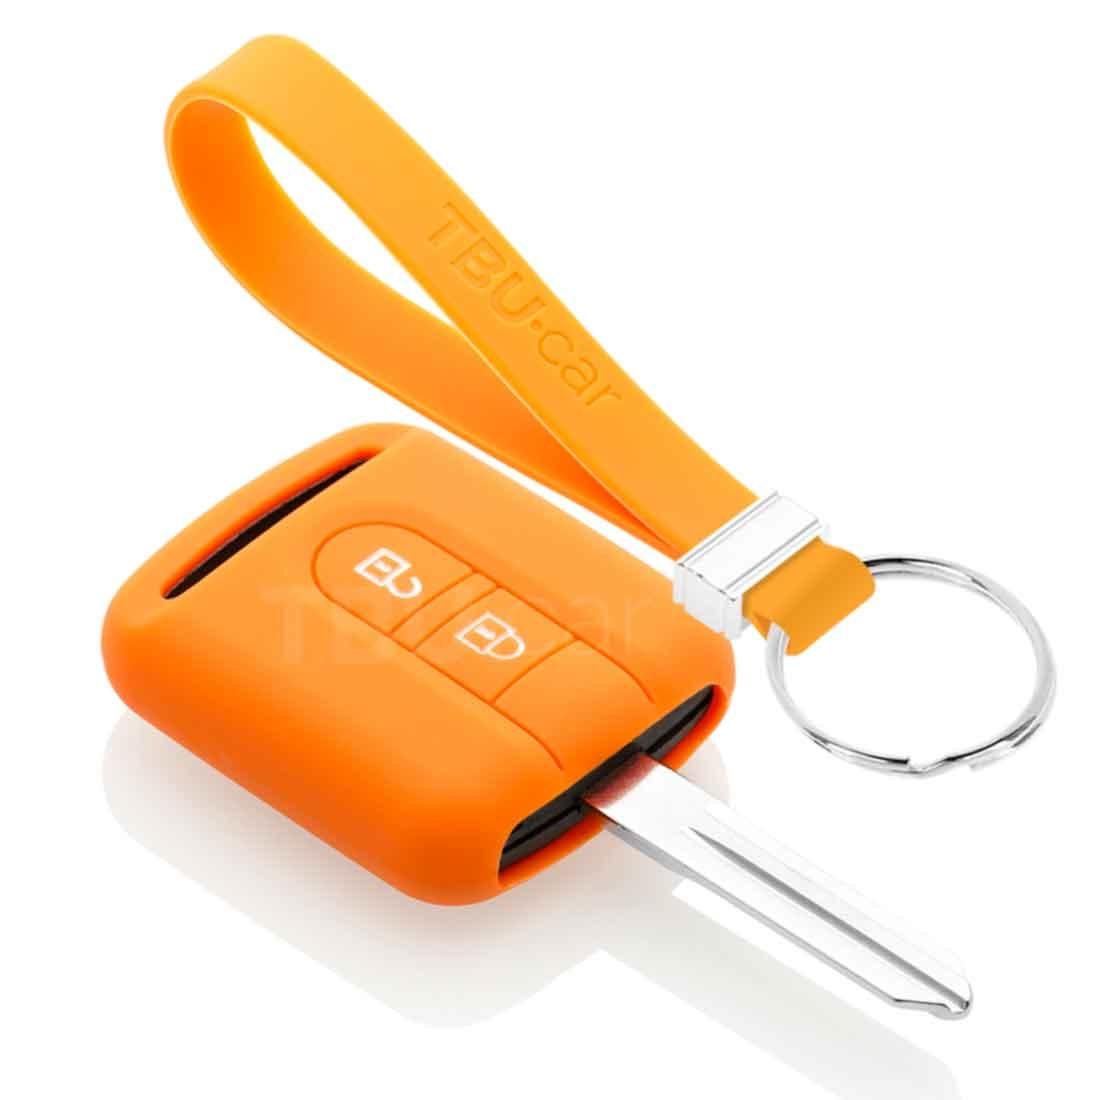 TBU car TBU car Sleutel cover compatibel met Nissan - Silicone sleutelhoesje - beschermhoesje autosleutel - Oranje